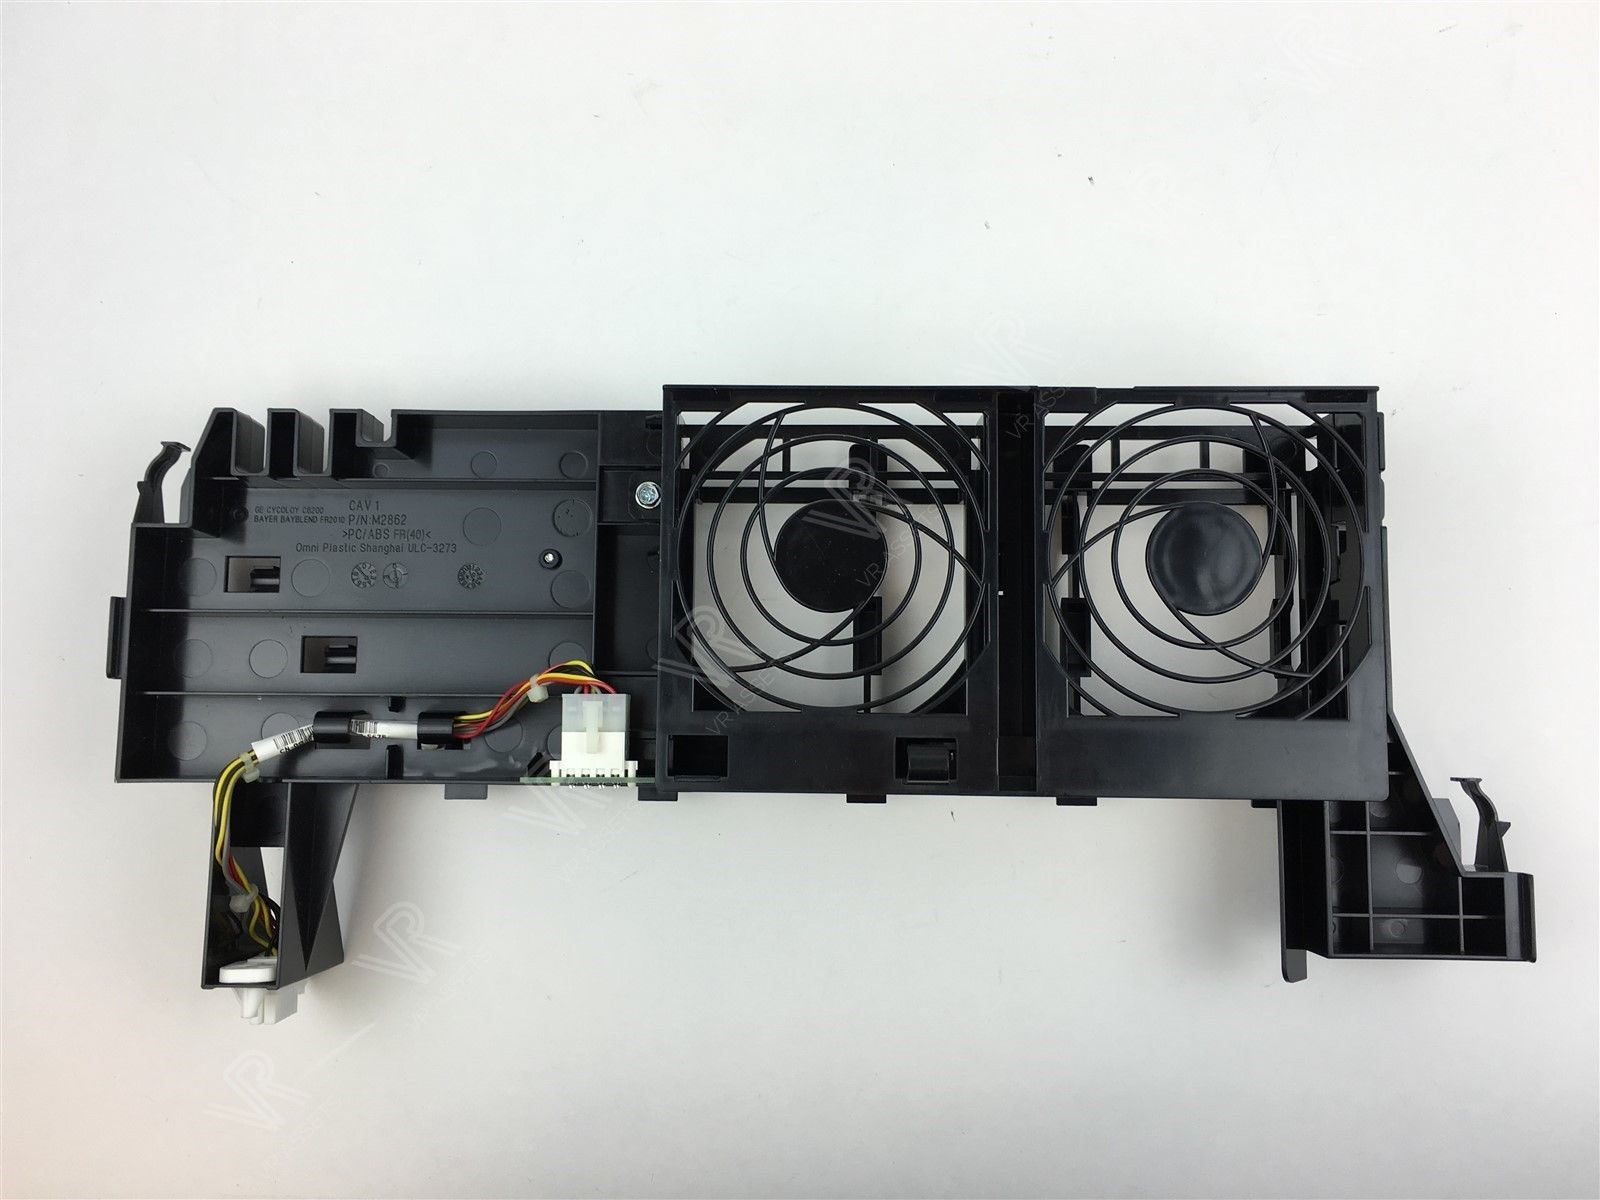 Dell X3899 Fan Assy Dell Poweredge 2800